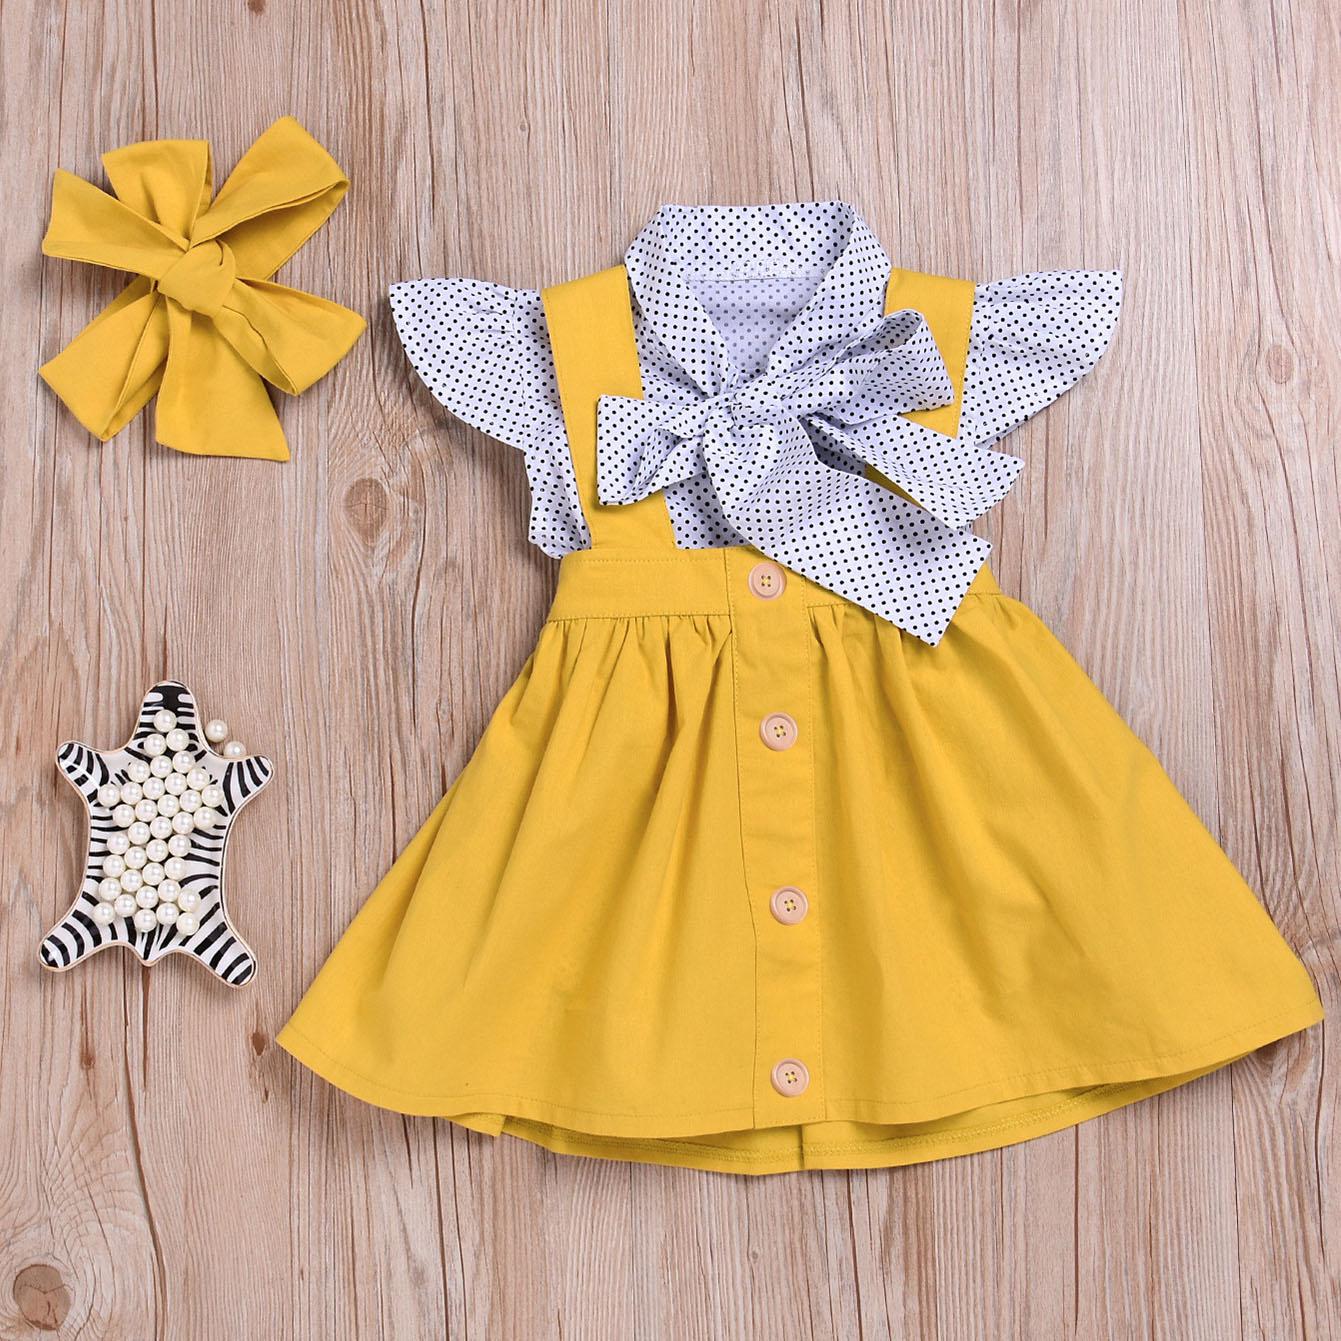 Polka Dot Print Top Suspender Skirt Sets With Hairband